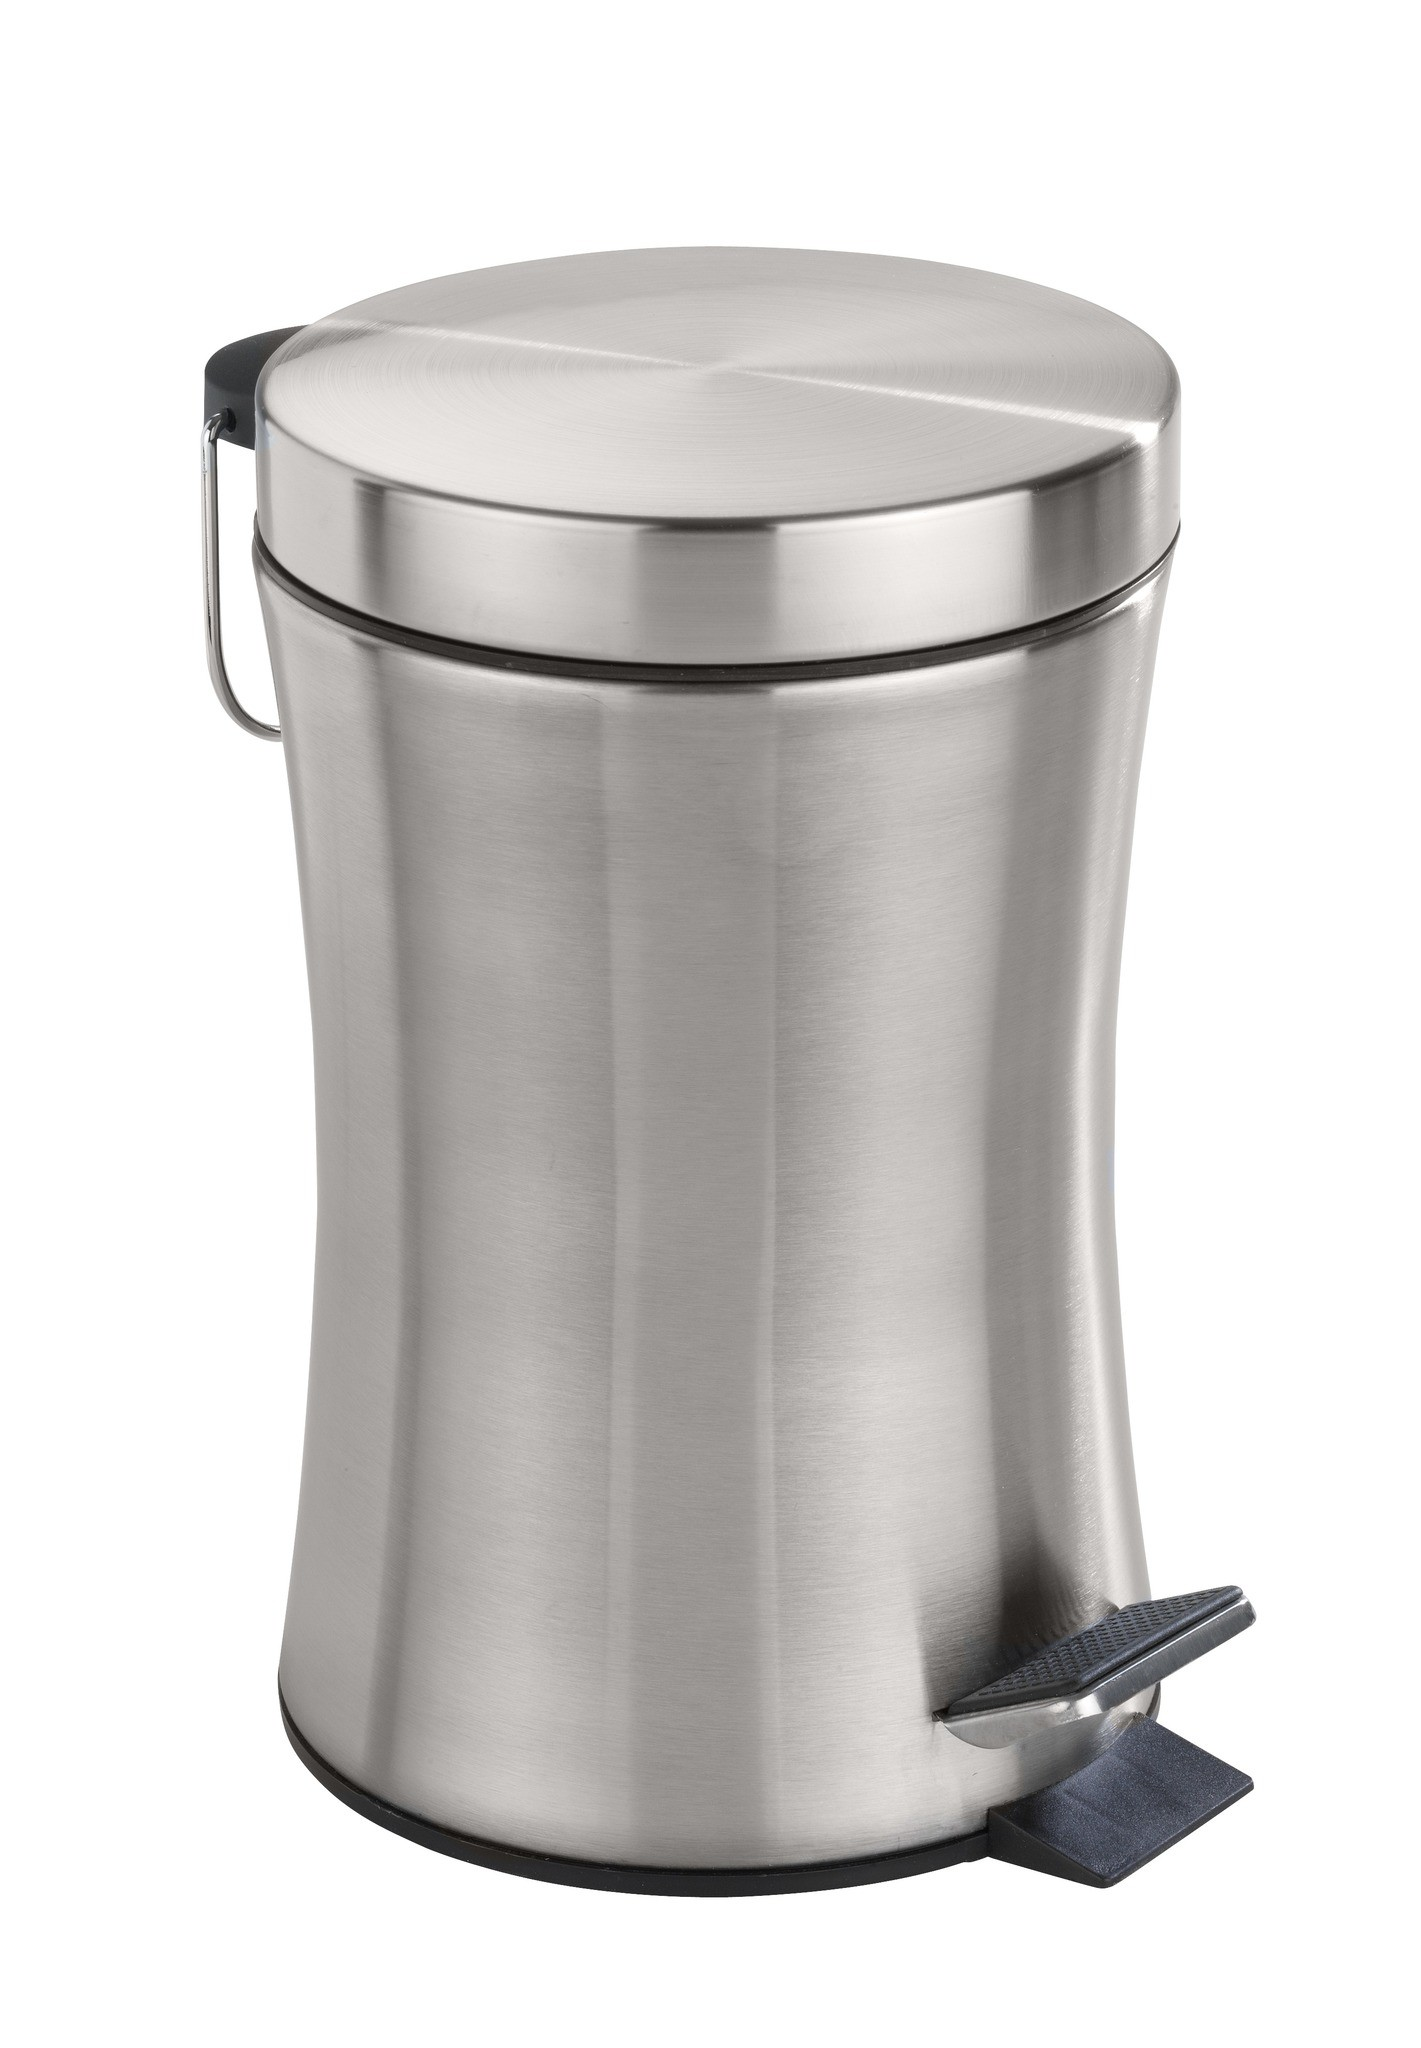 Kosmetik-Treteimer Pieno, 3 Liter, Edelstahl rostfrei